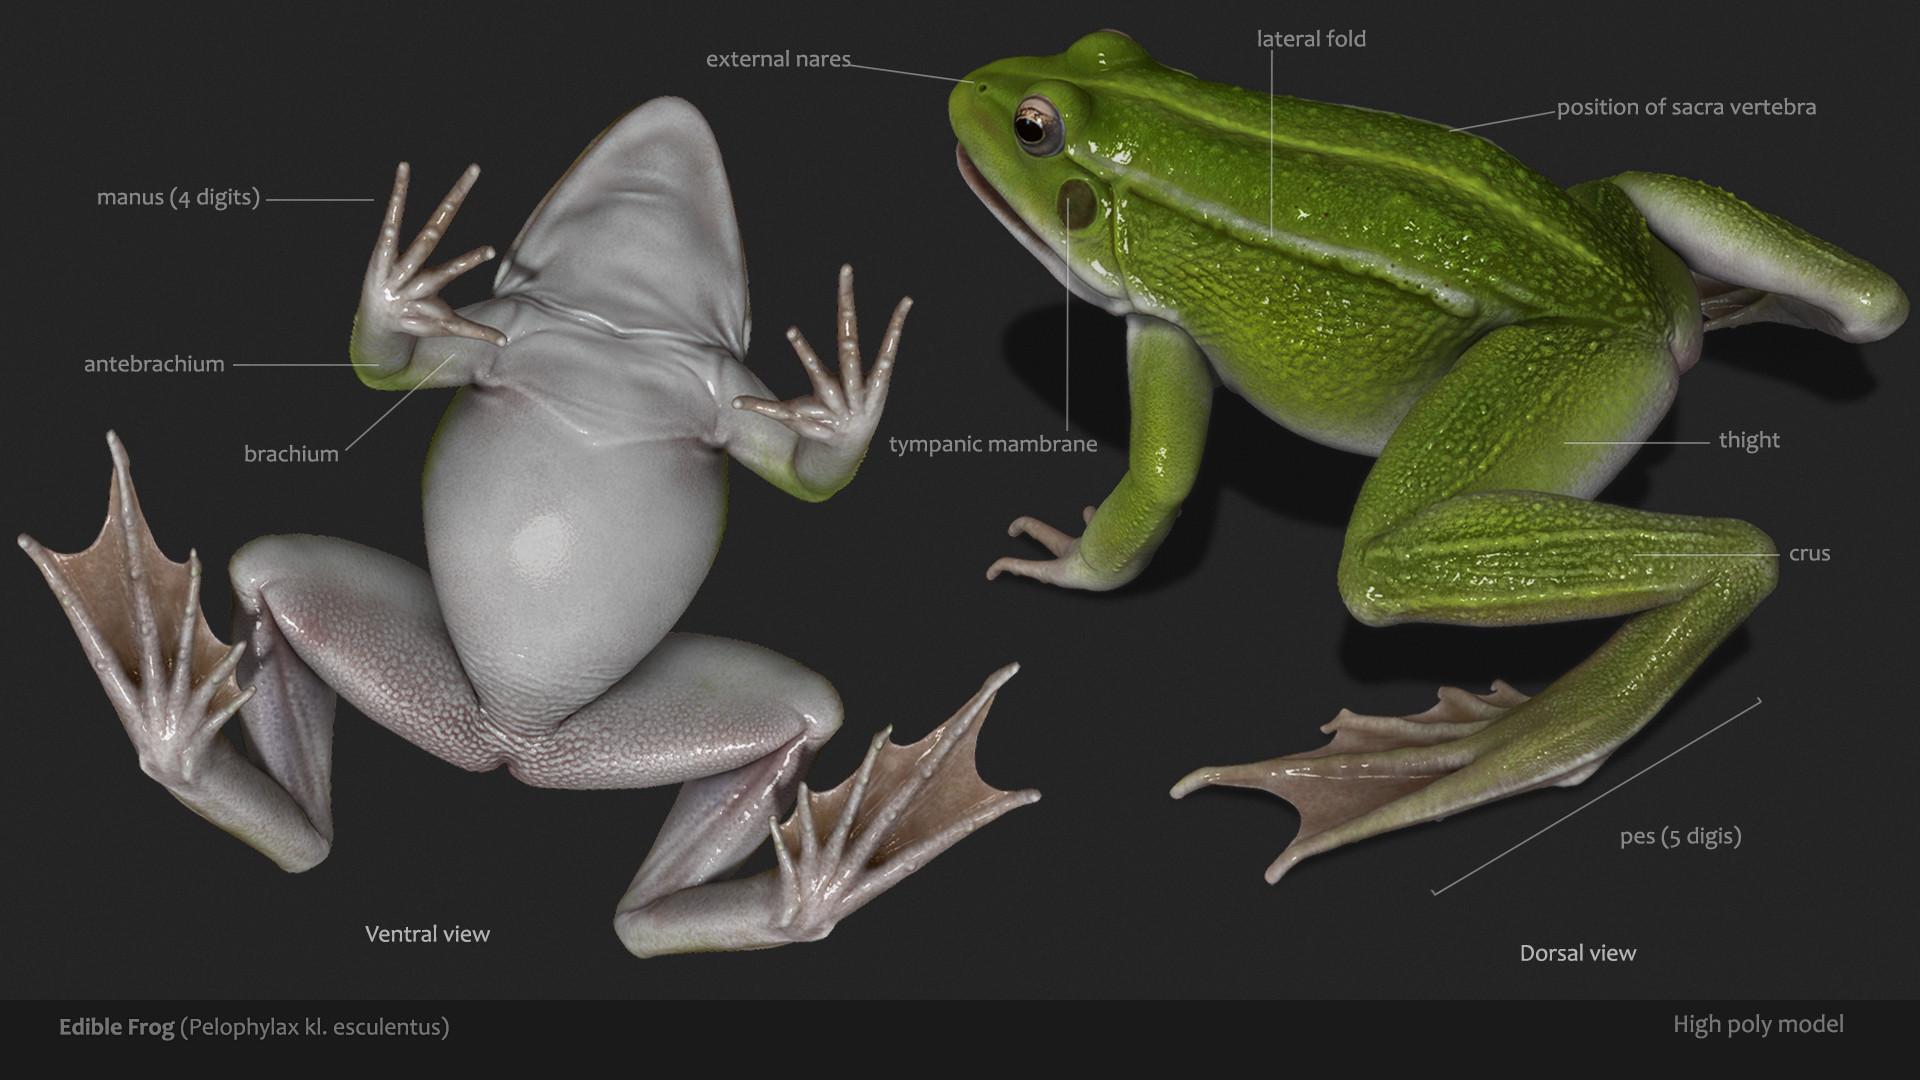 ArtStation - Amphibian anatomy (real time frog), Peter Hogya